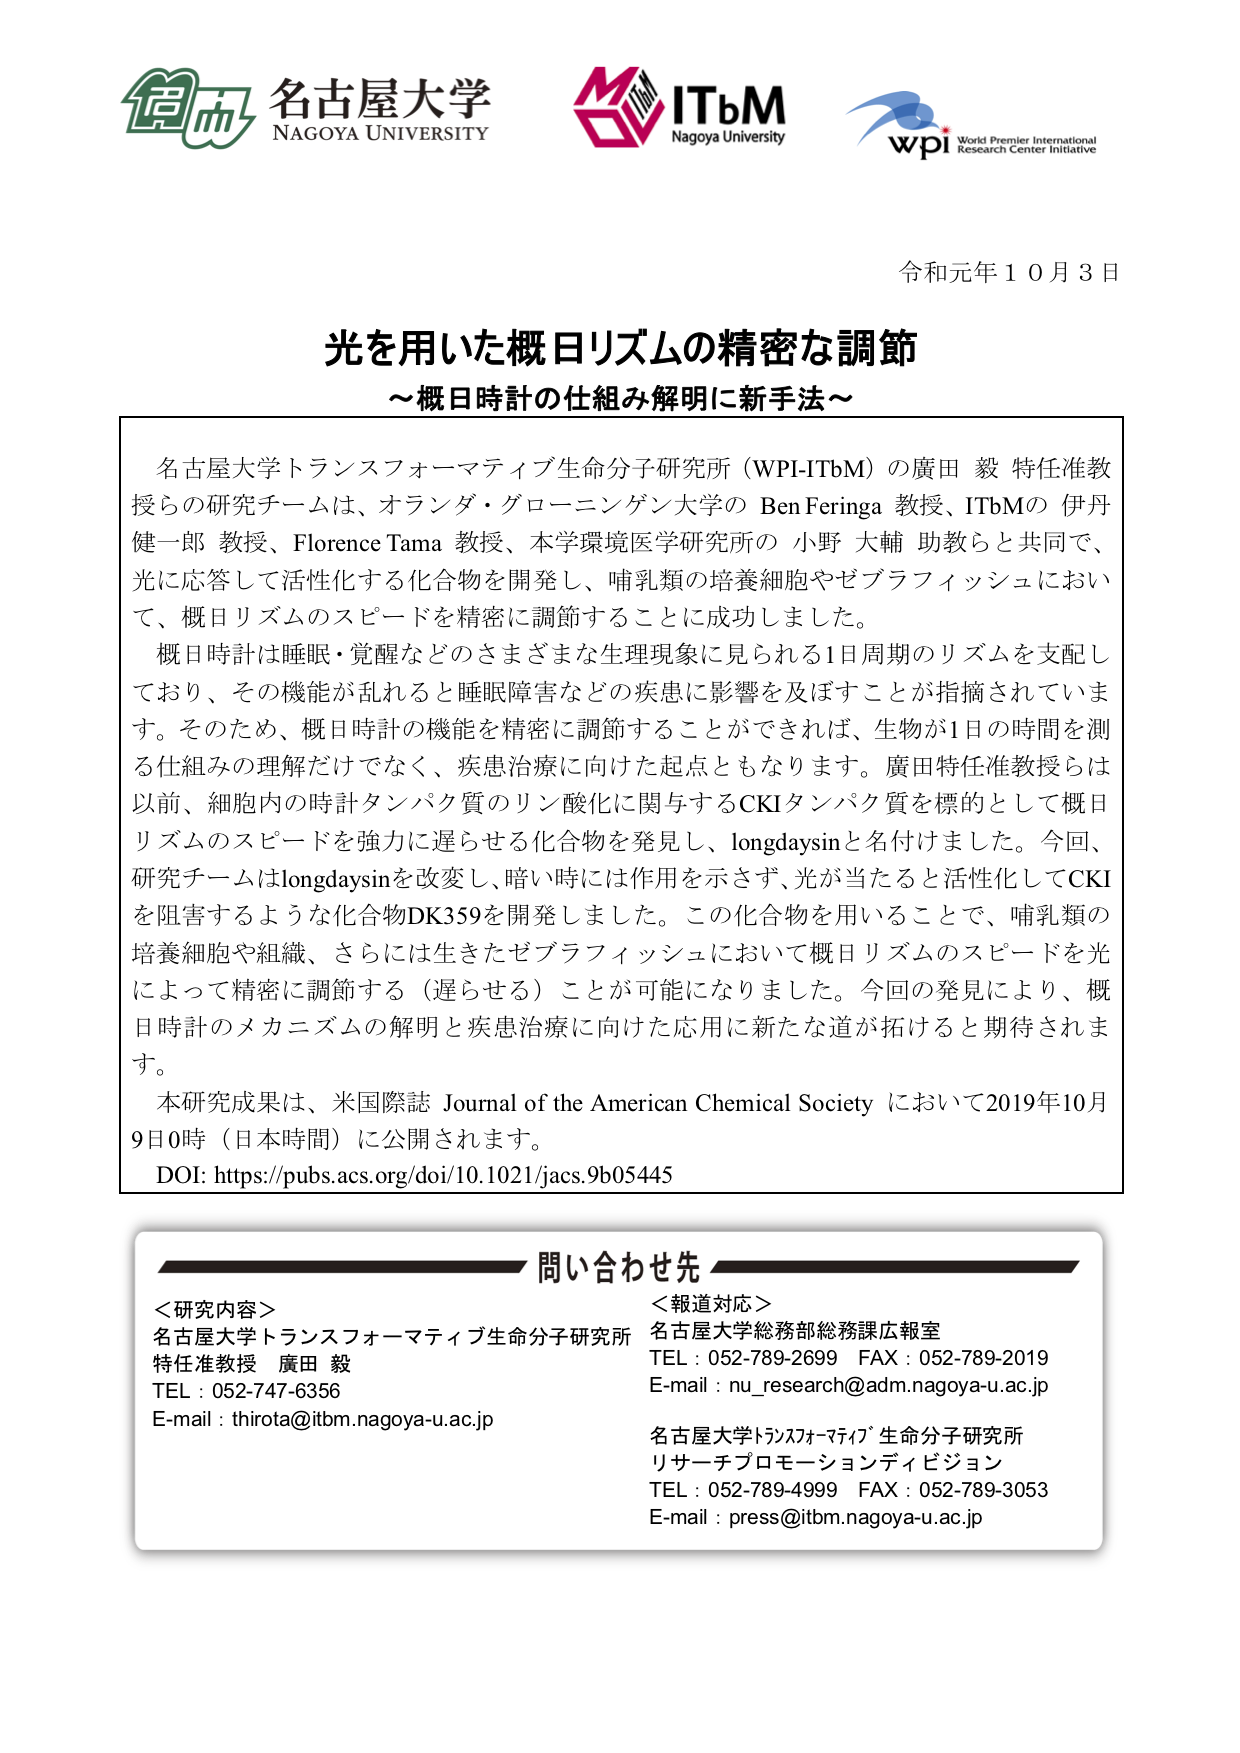 http://www.itbm.nagoya-u.ac.jp/ja/research/ITbM-Hirota-20191002_final-modifyv2.png